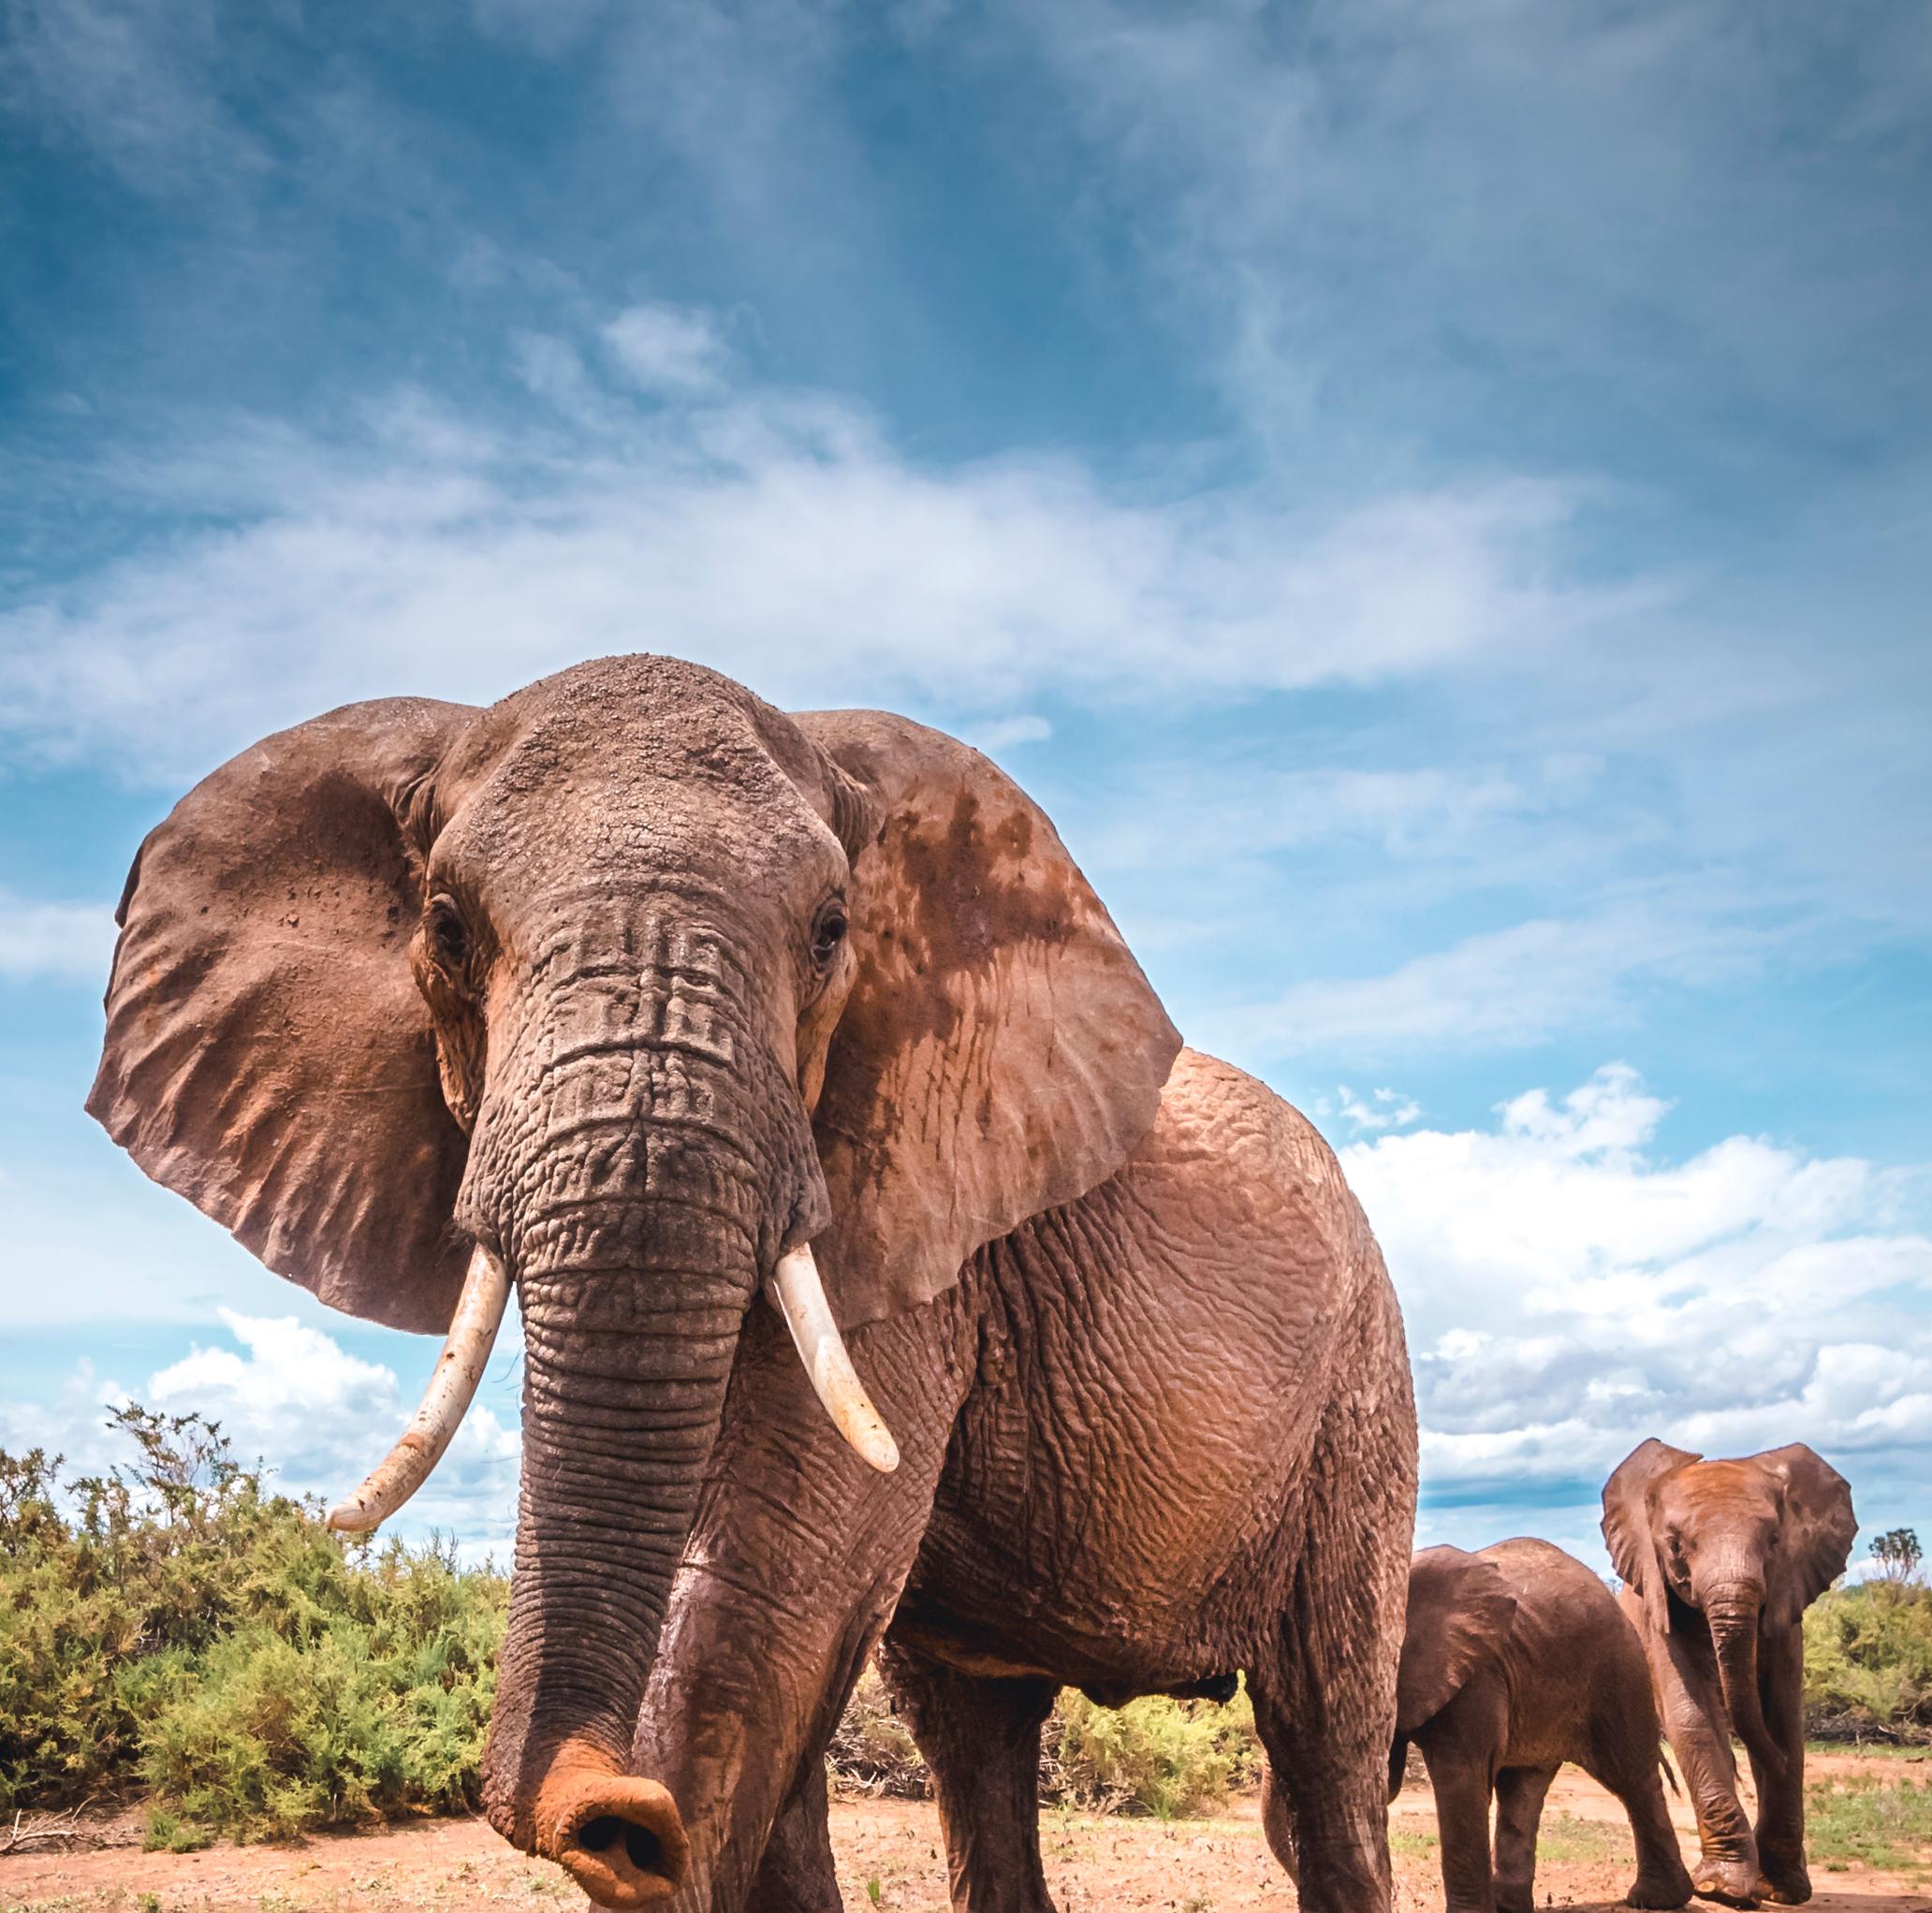 Feeling the beat through the elephant's feet | University of